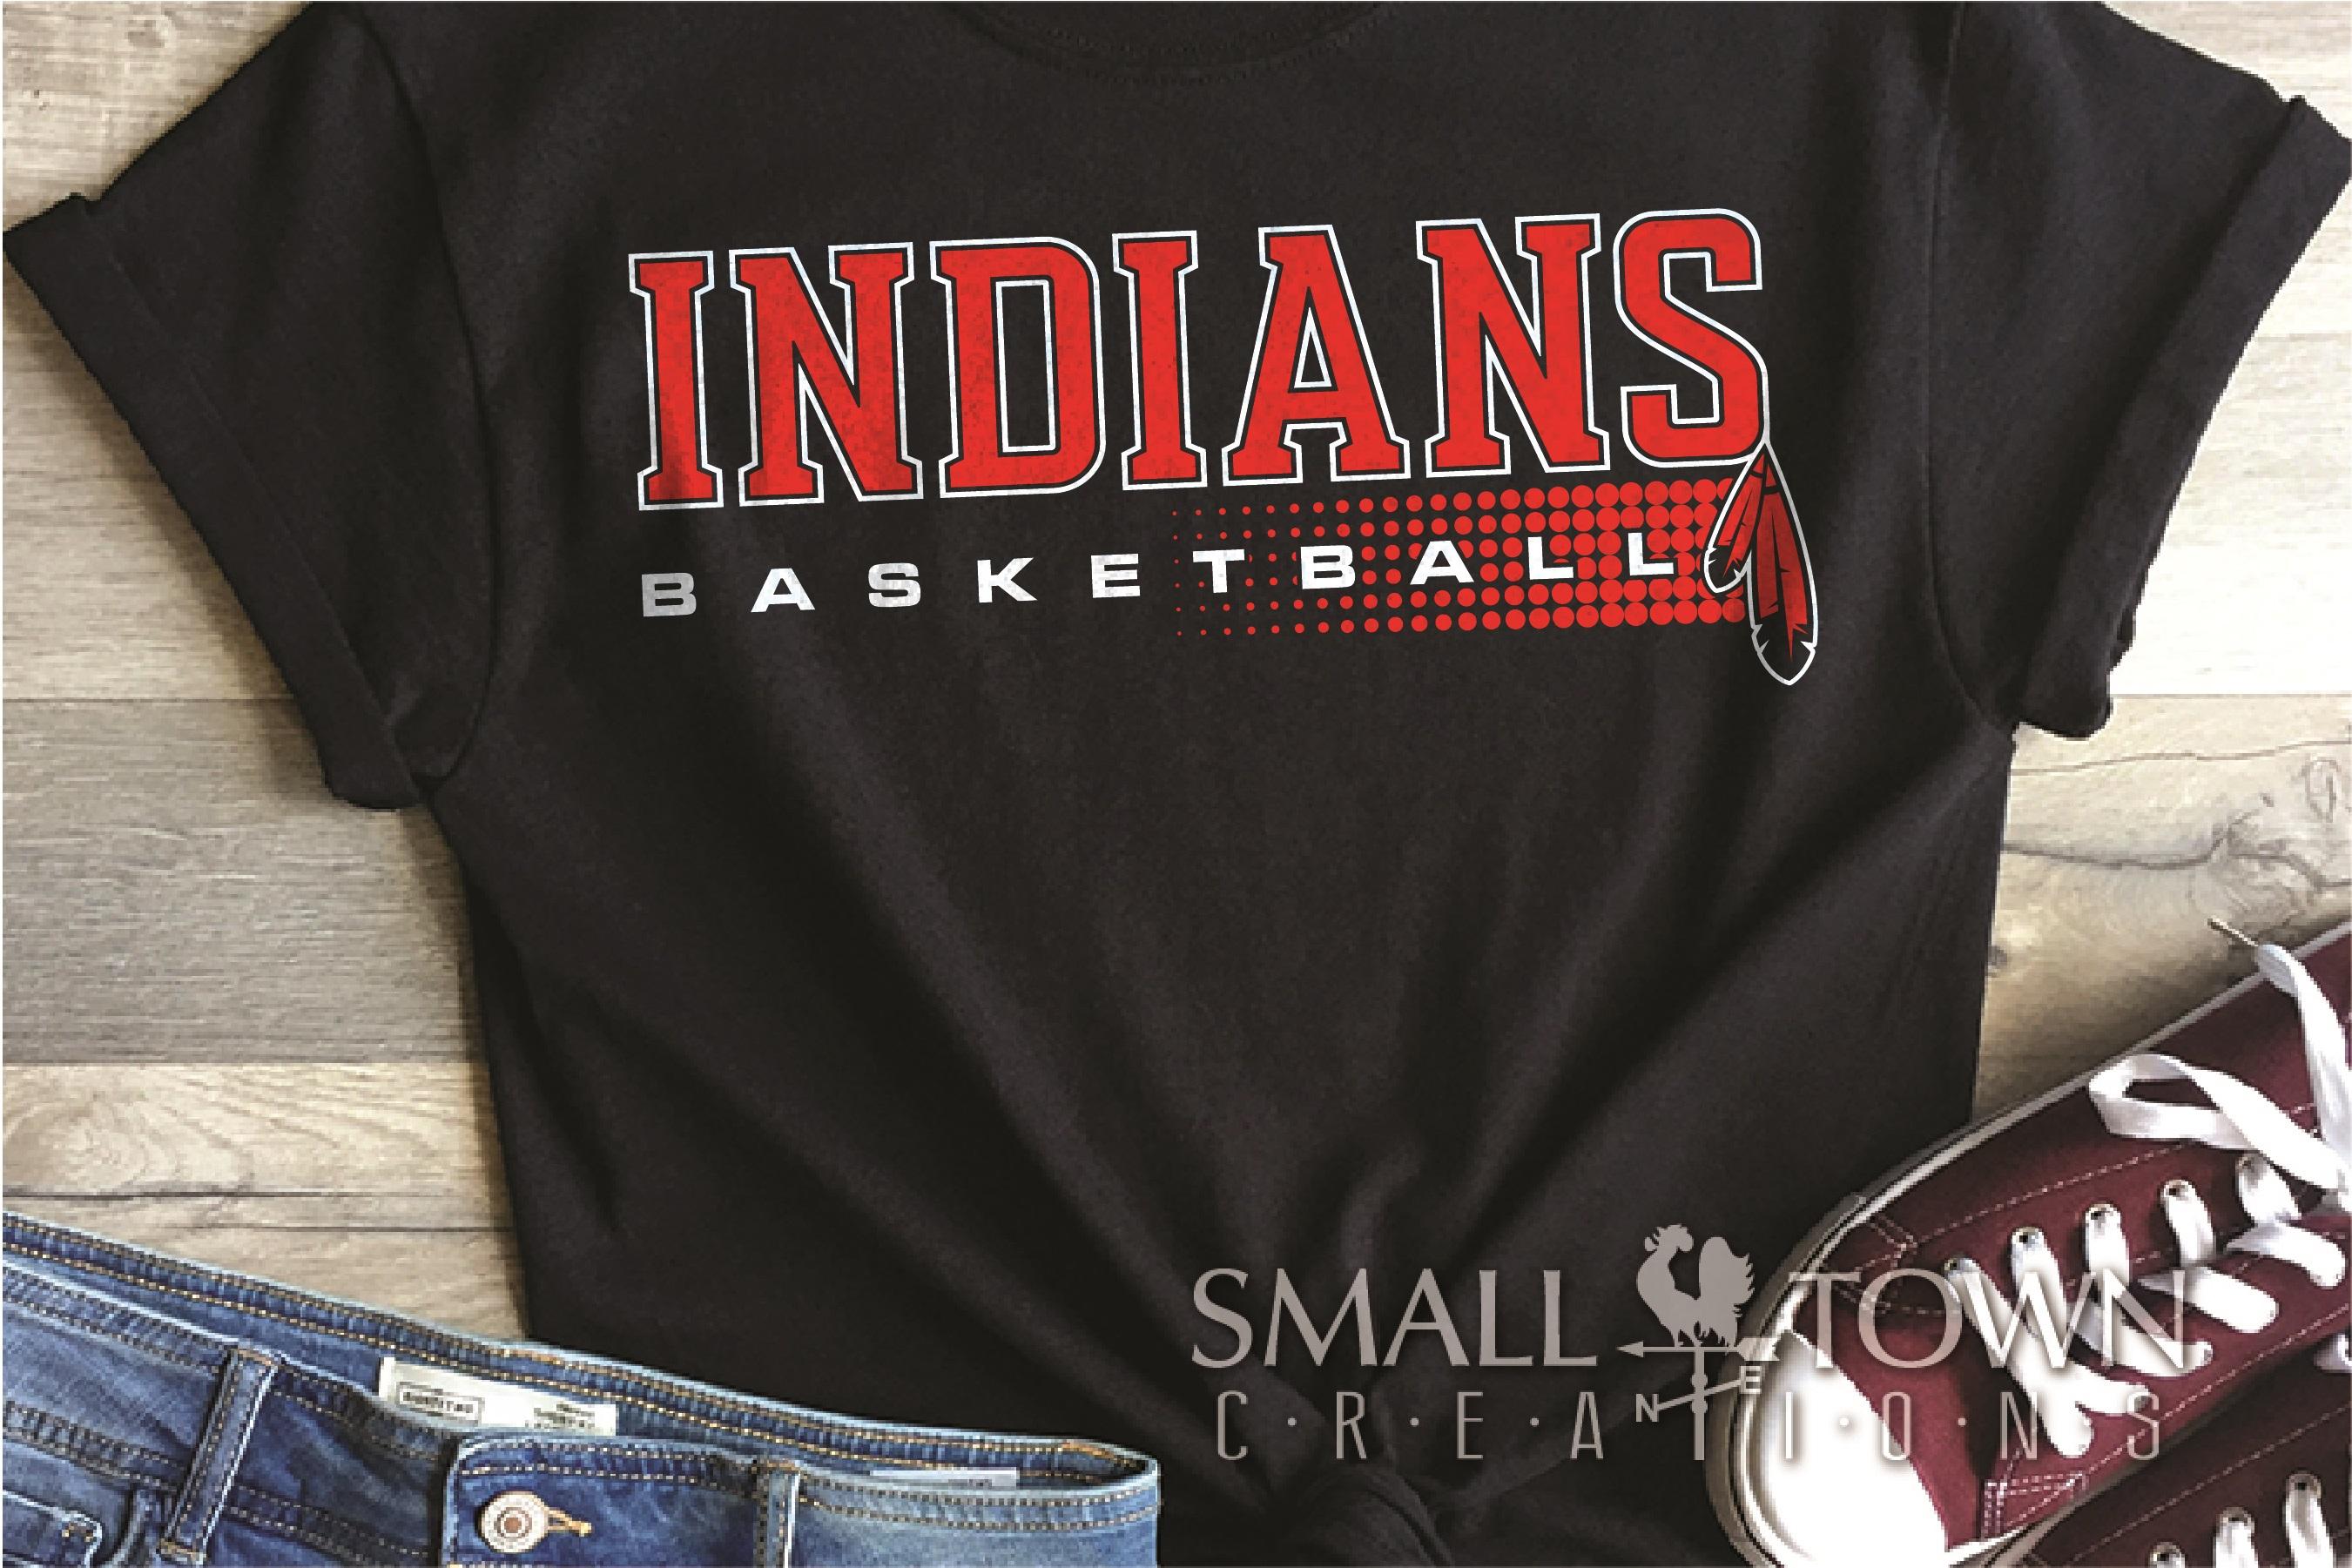 Indian, Indian basketball, Team, logo, PRINT, CUT & DESIGN example image 1